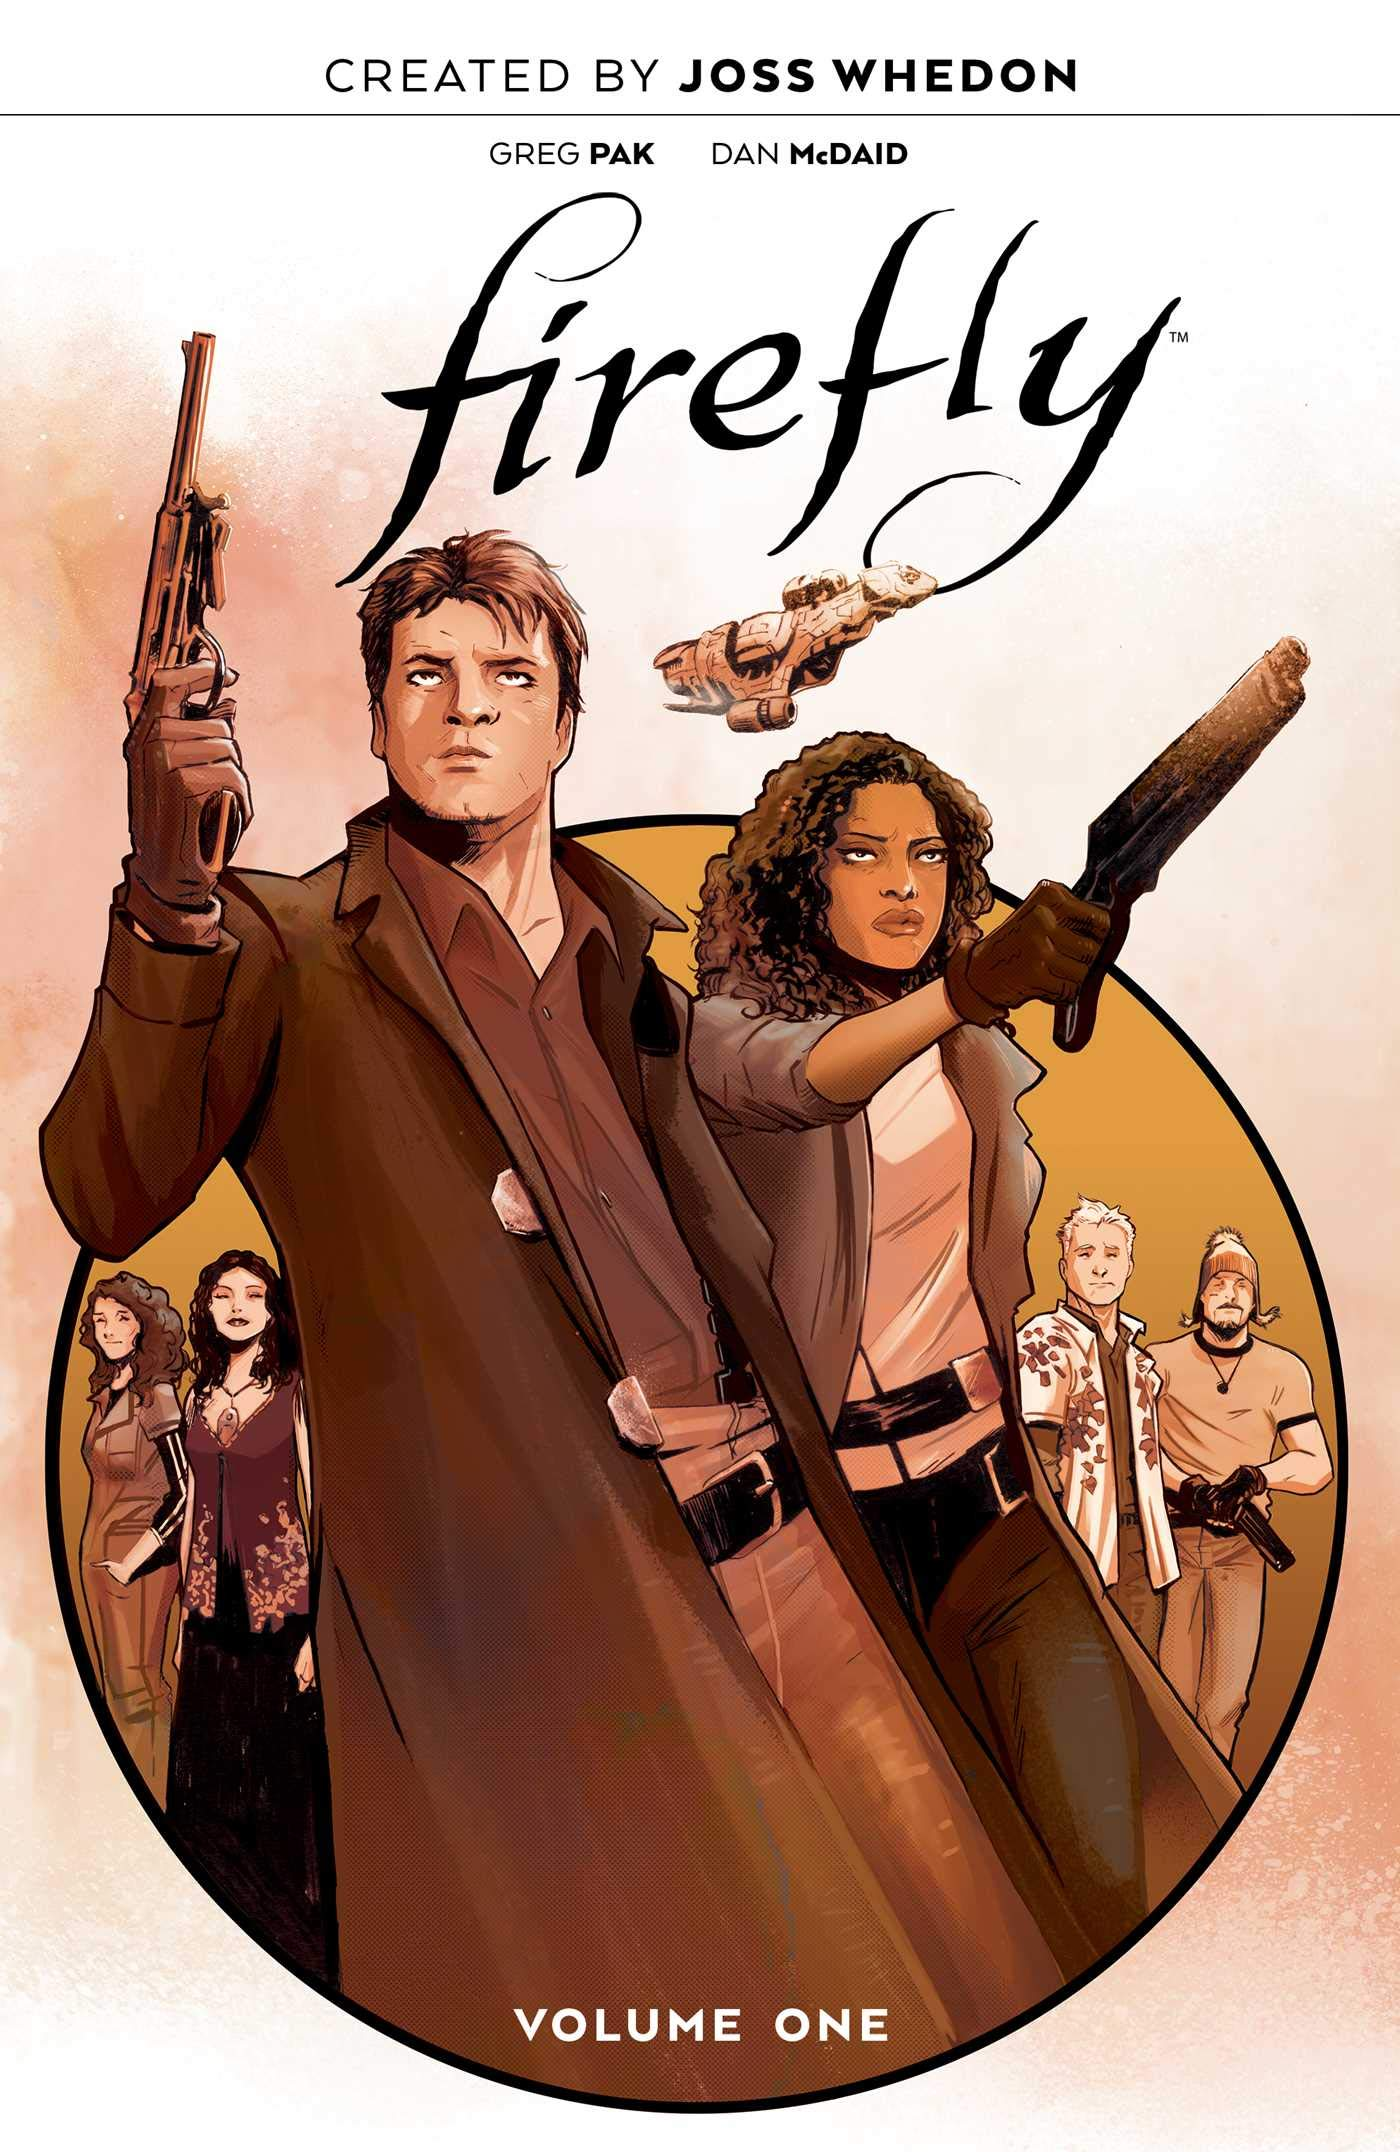 Firefly, Vol. 1: Amazon.es: Joss Whedon, Greg Pak, Dan McDaid ...